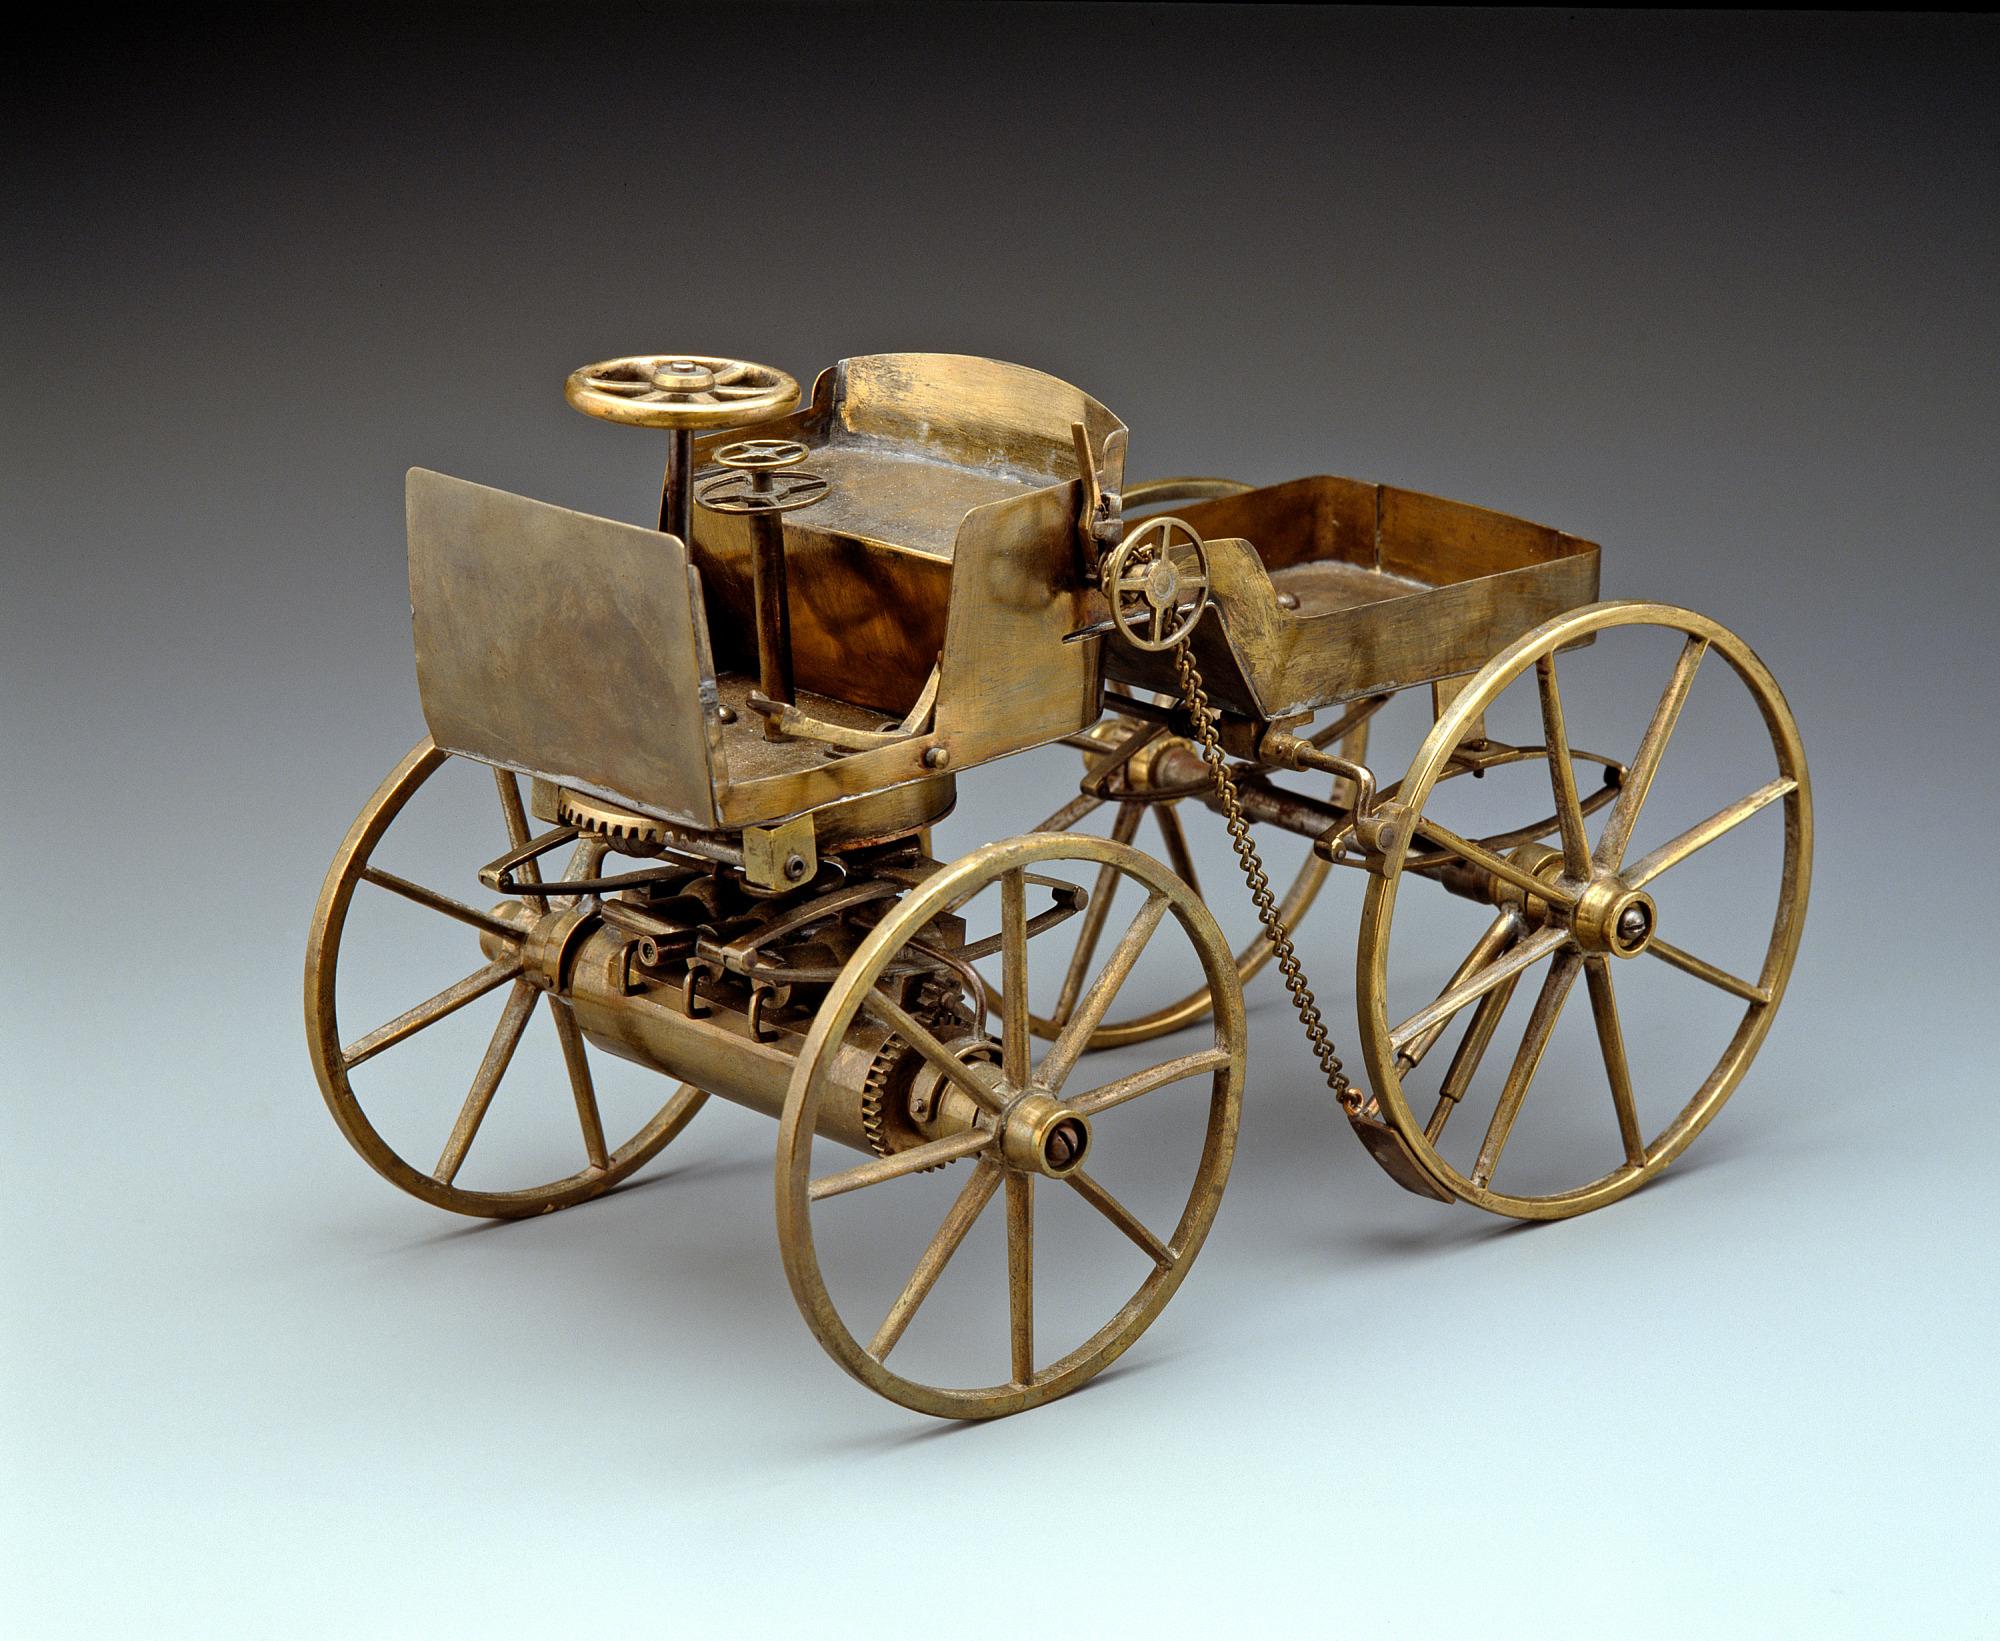 George Selden's automobile patent model, 1879